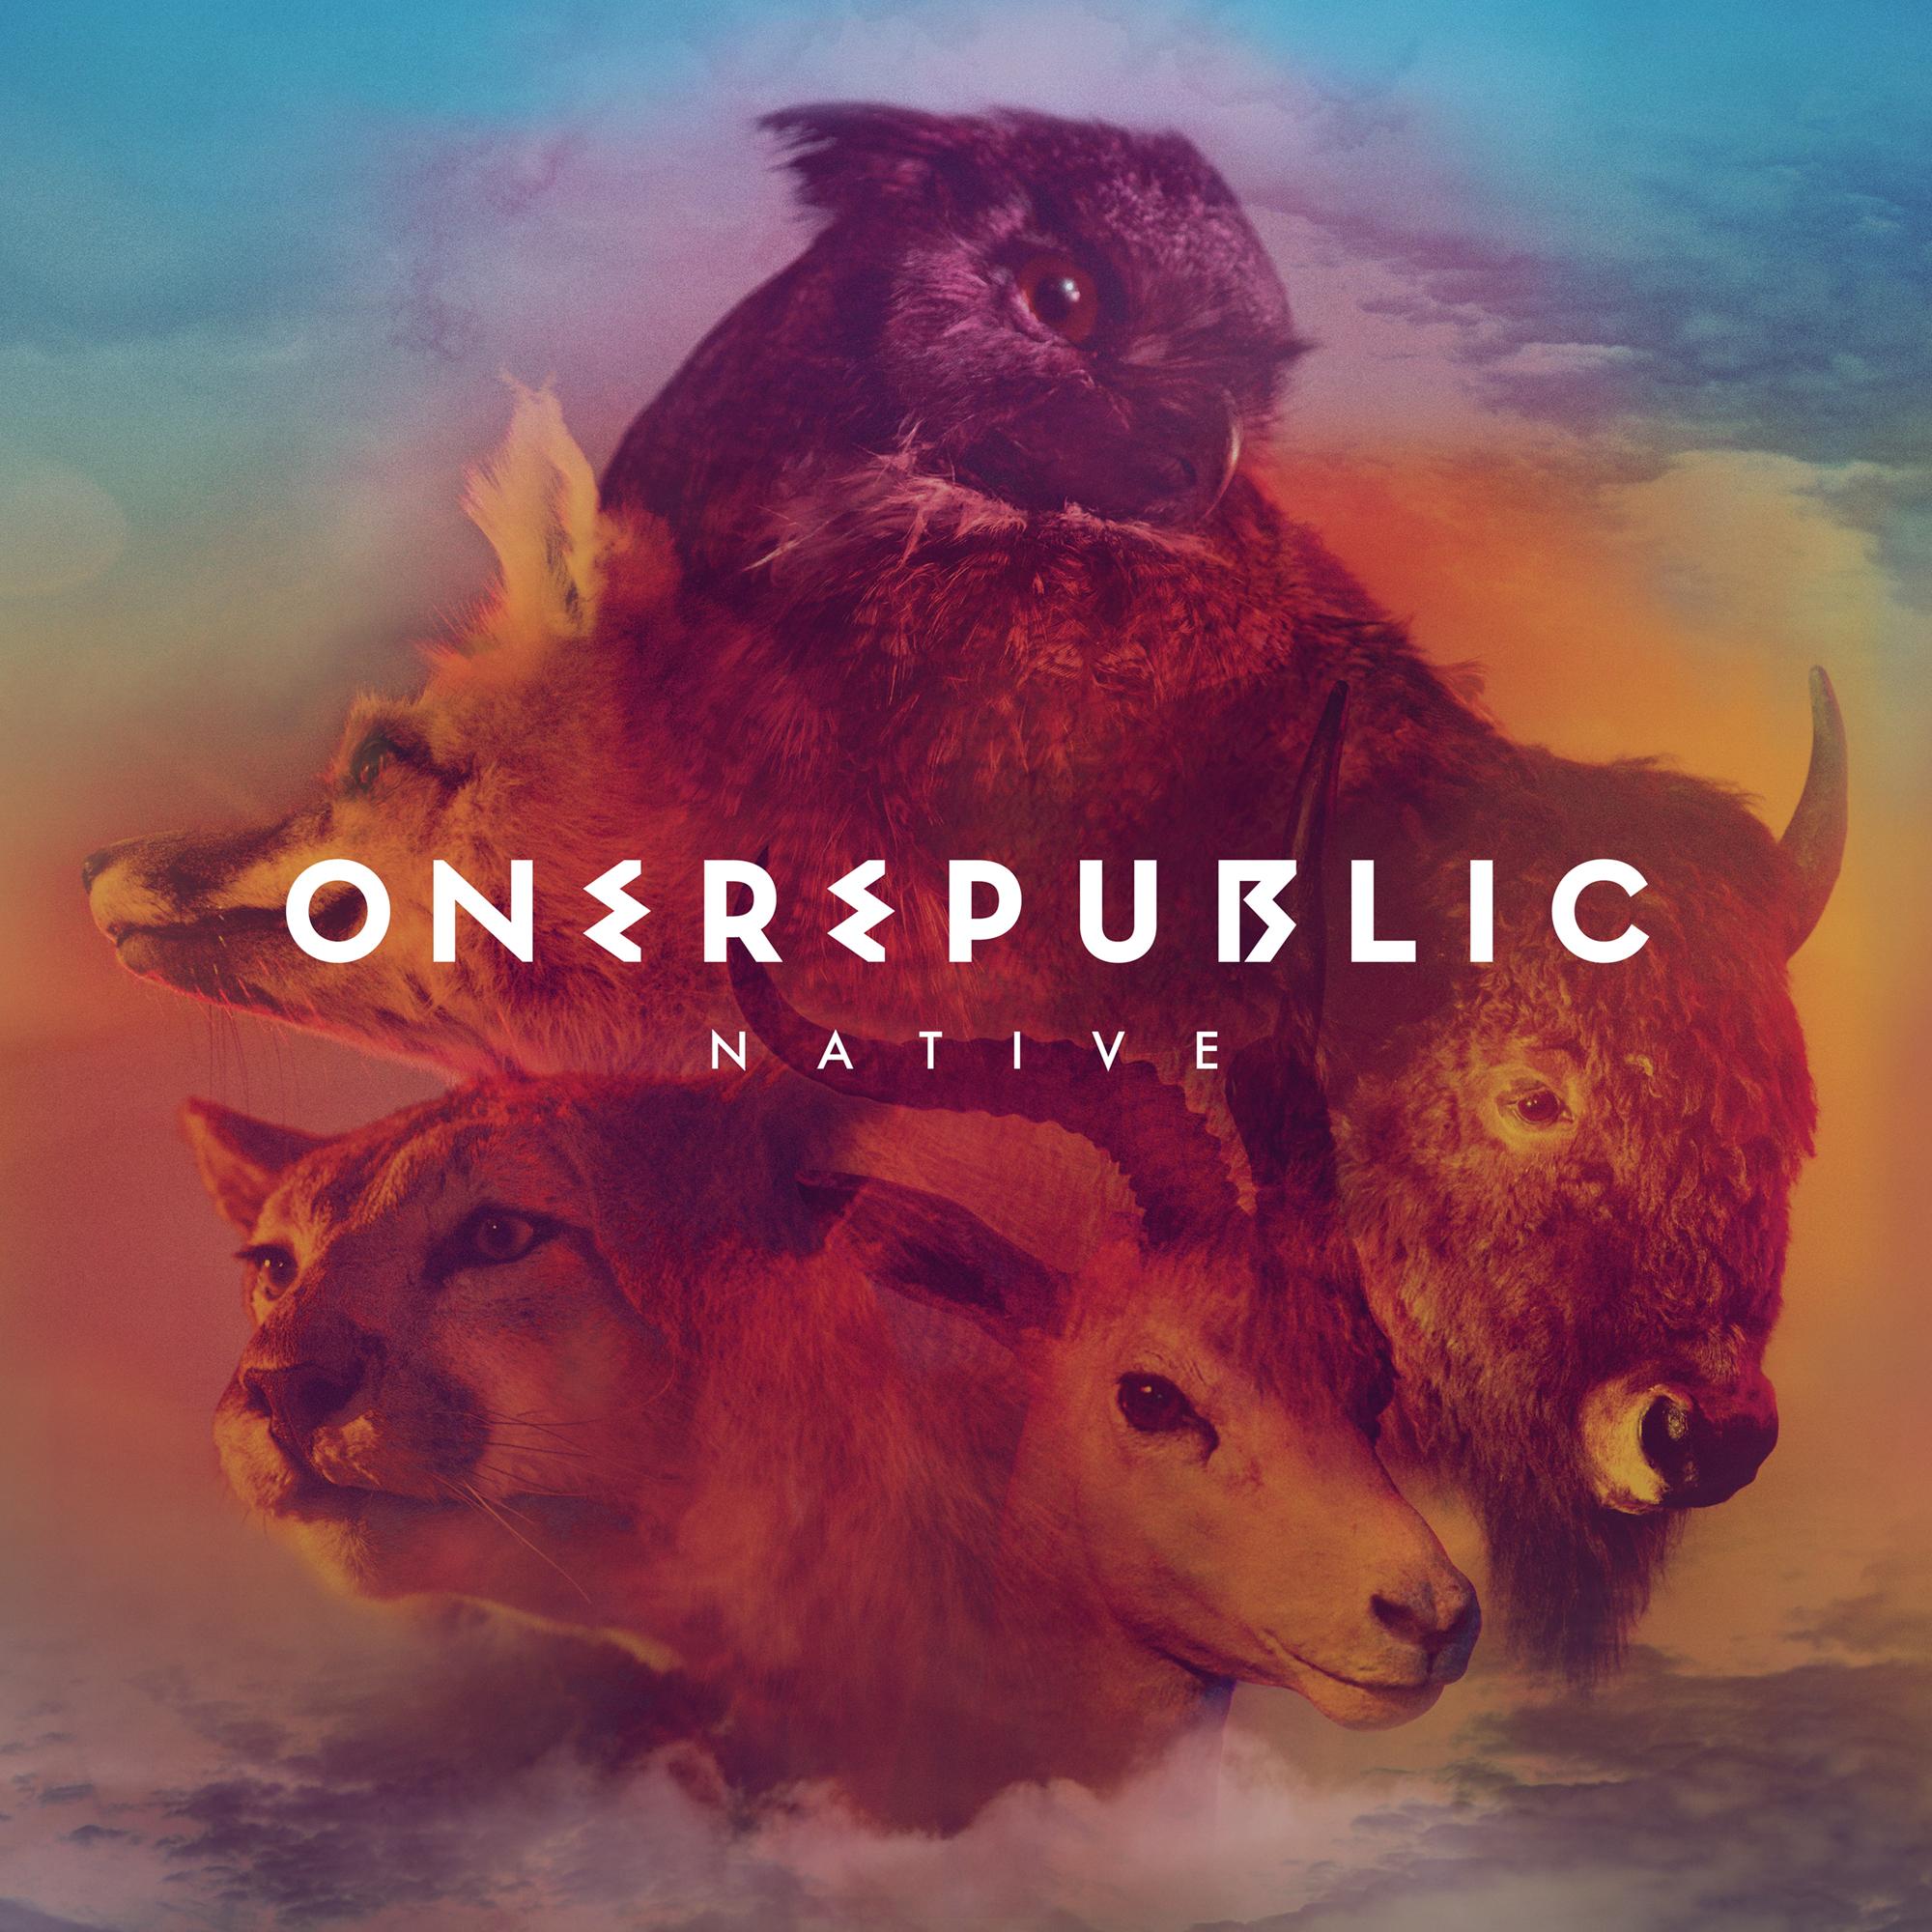 Onerepublic native album download tpb google docs.